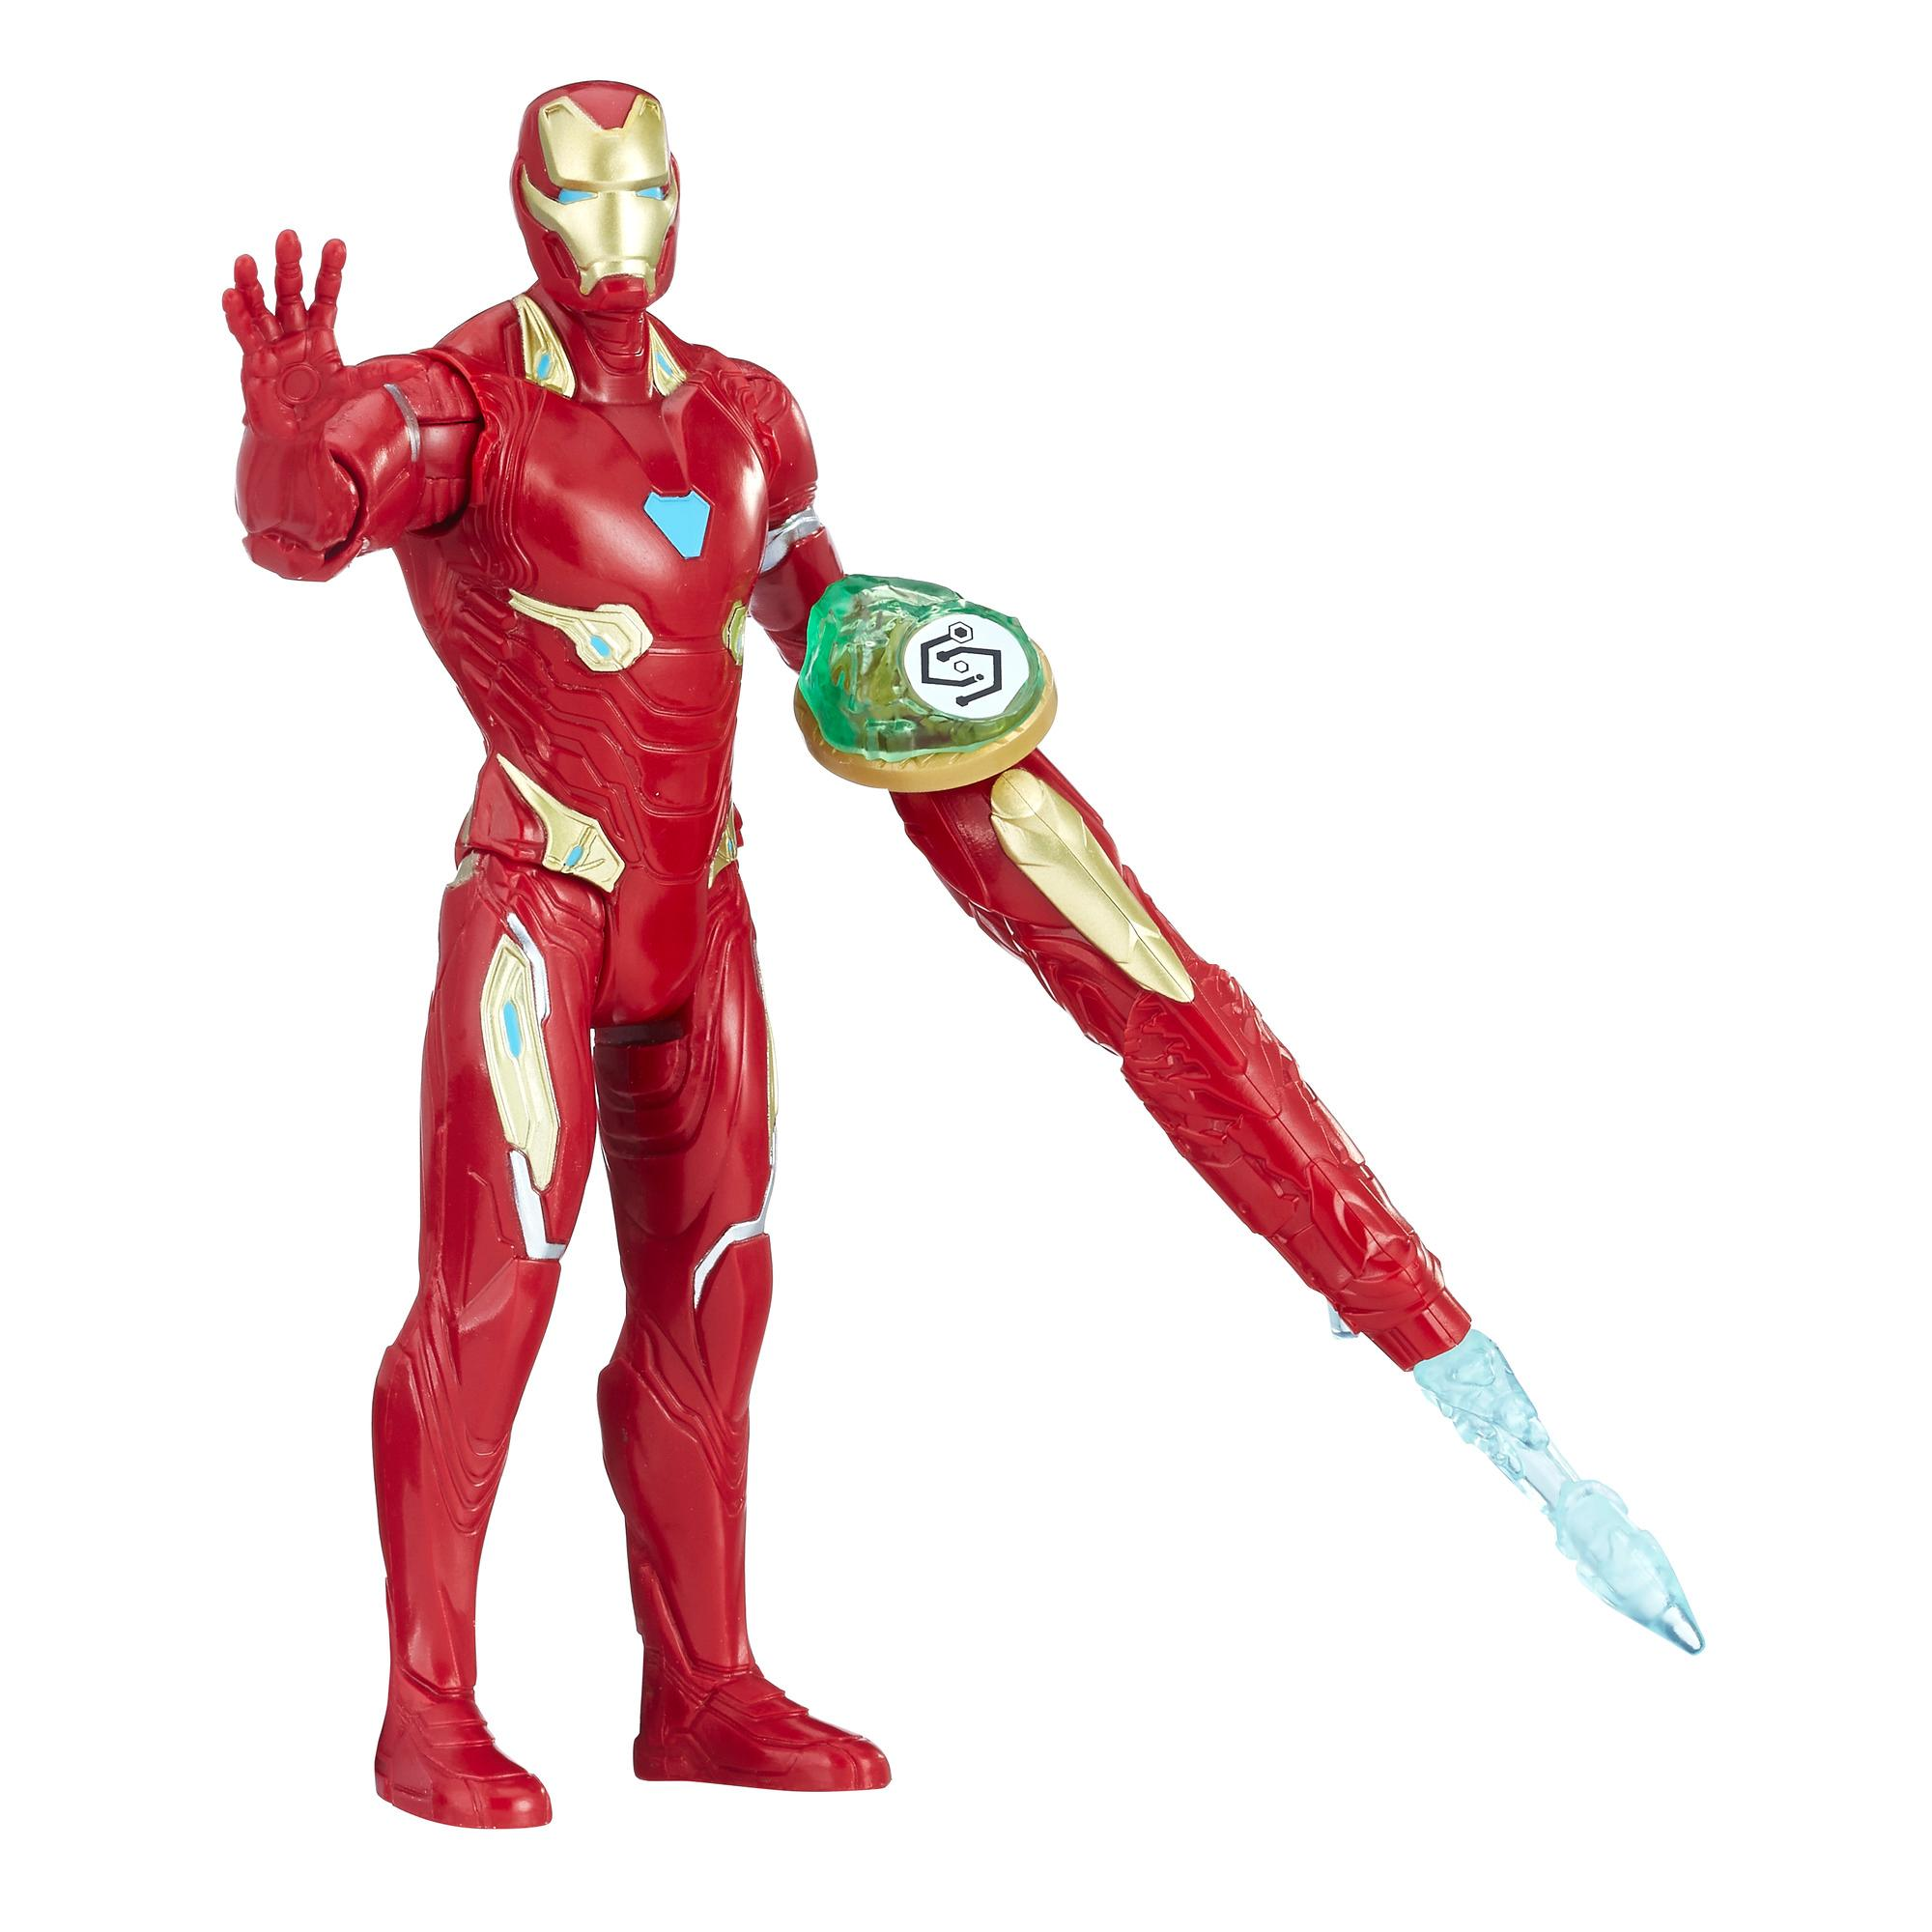 Marvel Avengers: Infinity War Iron Man with Infinity Stone